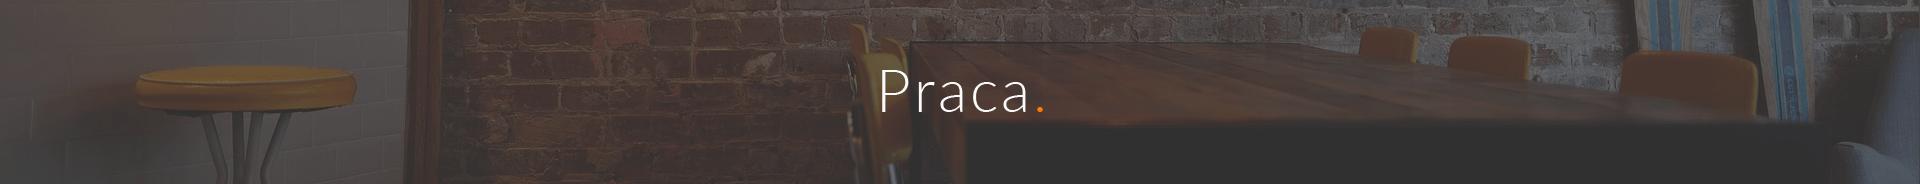 banner-praca.png